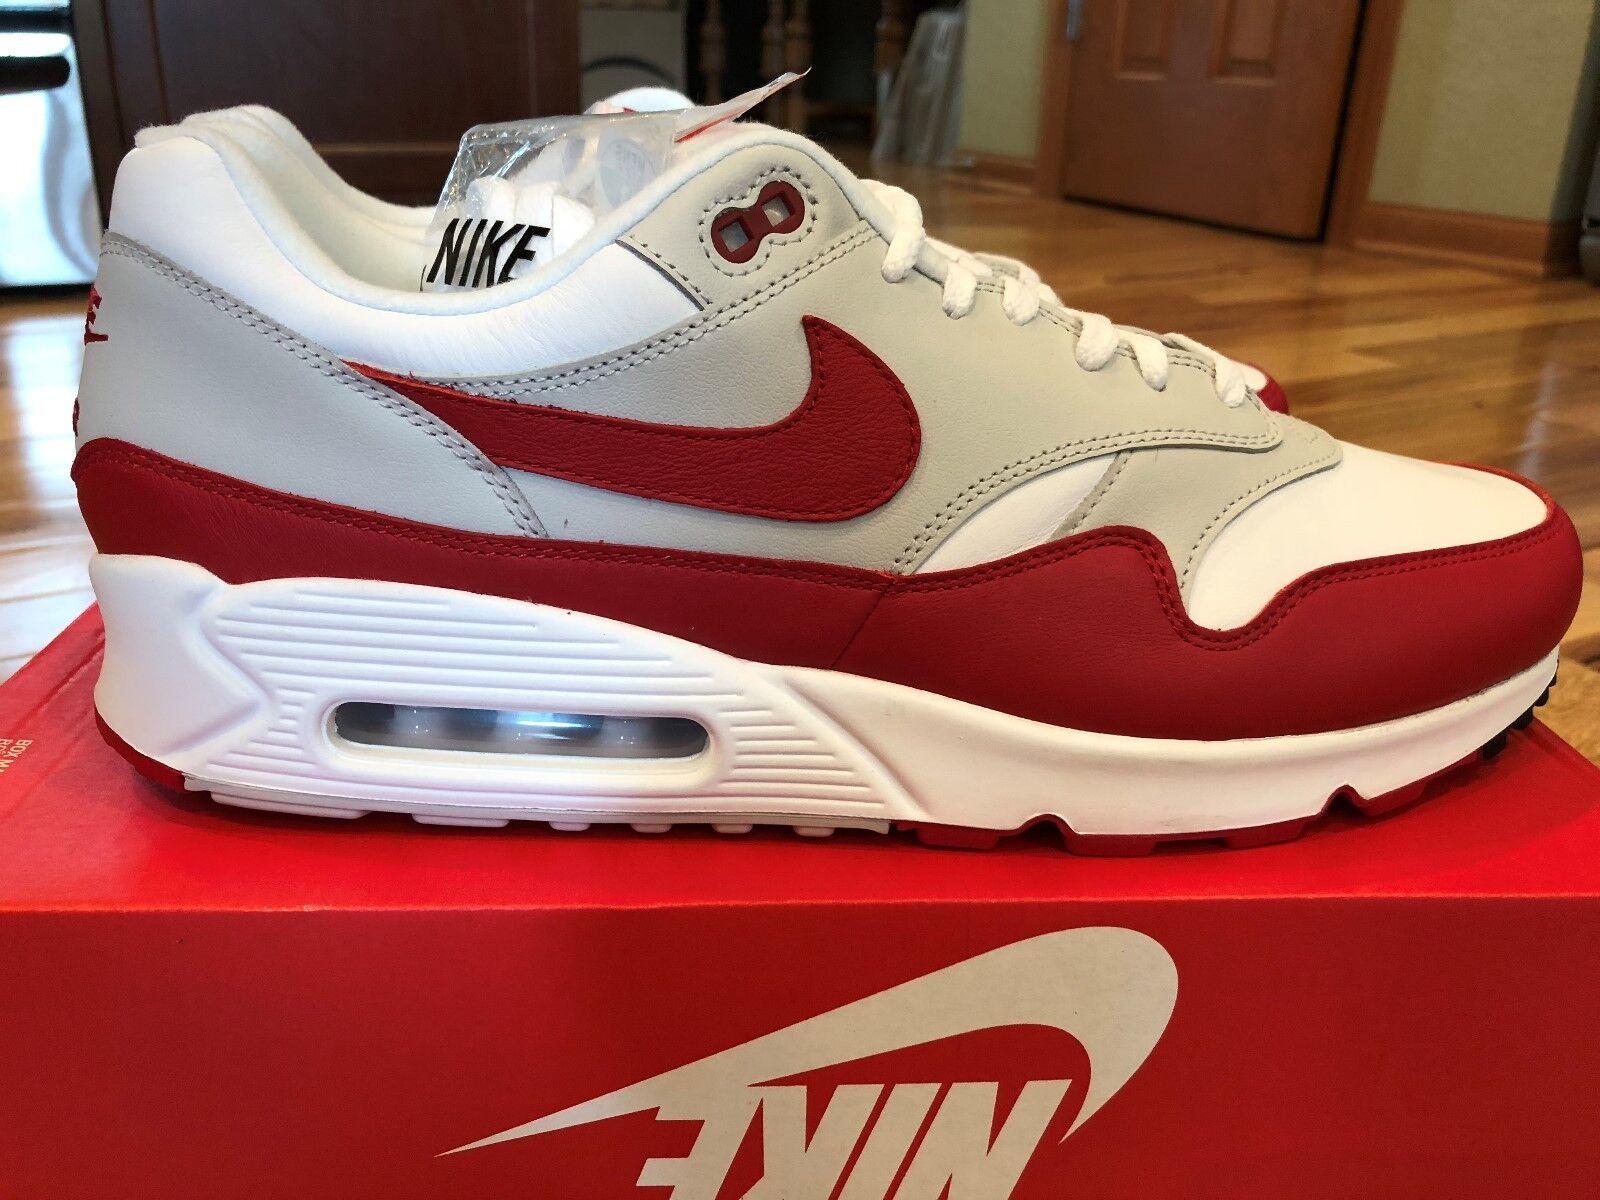 Nike aj7695 air max 90 / 1 white university red aj7695 Nike 100 uomini numero 13 noboxtop 811aa7